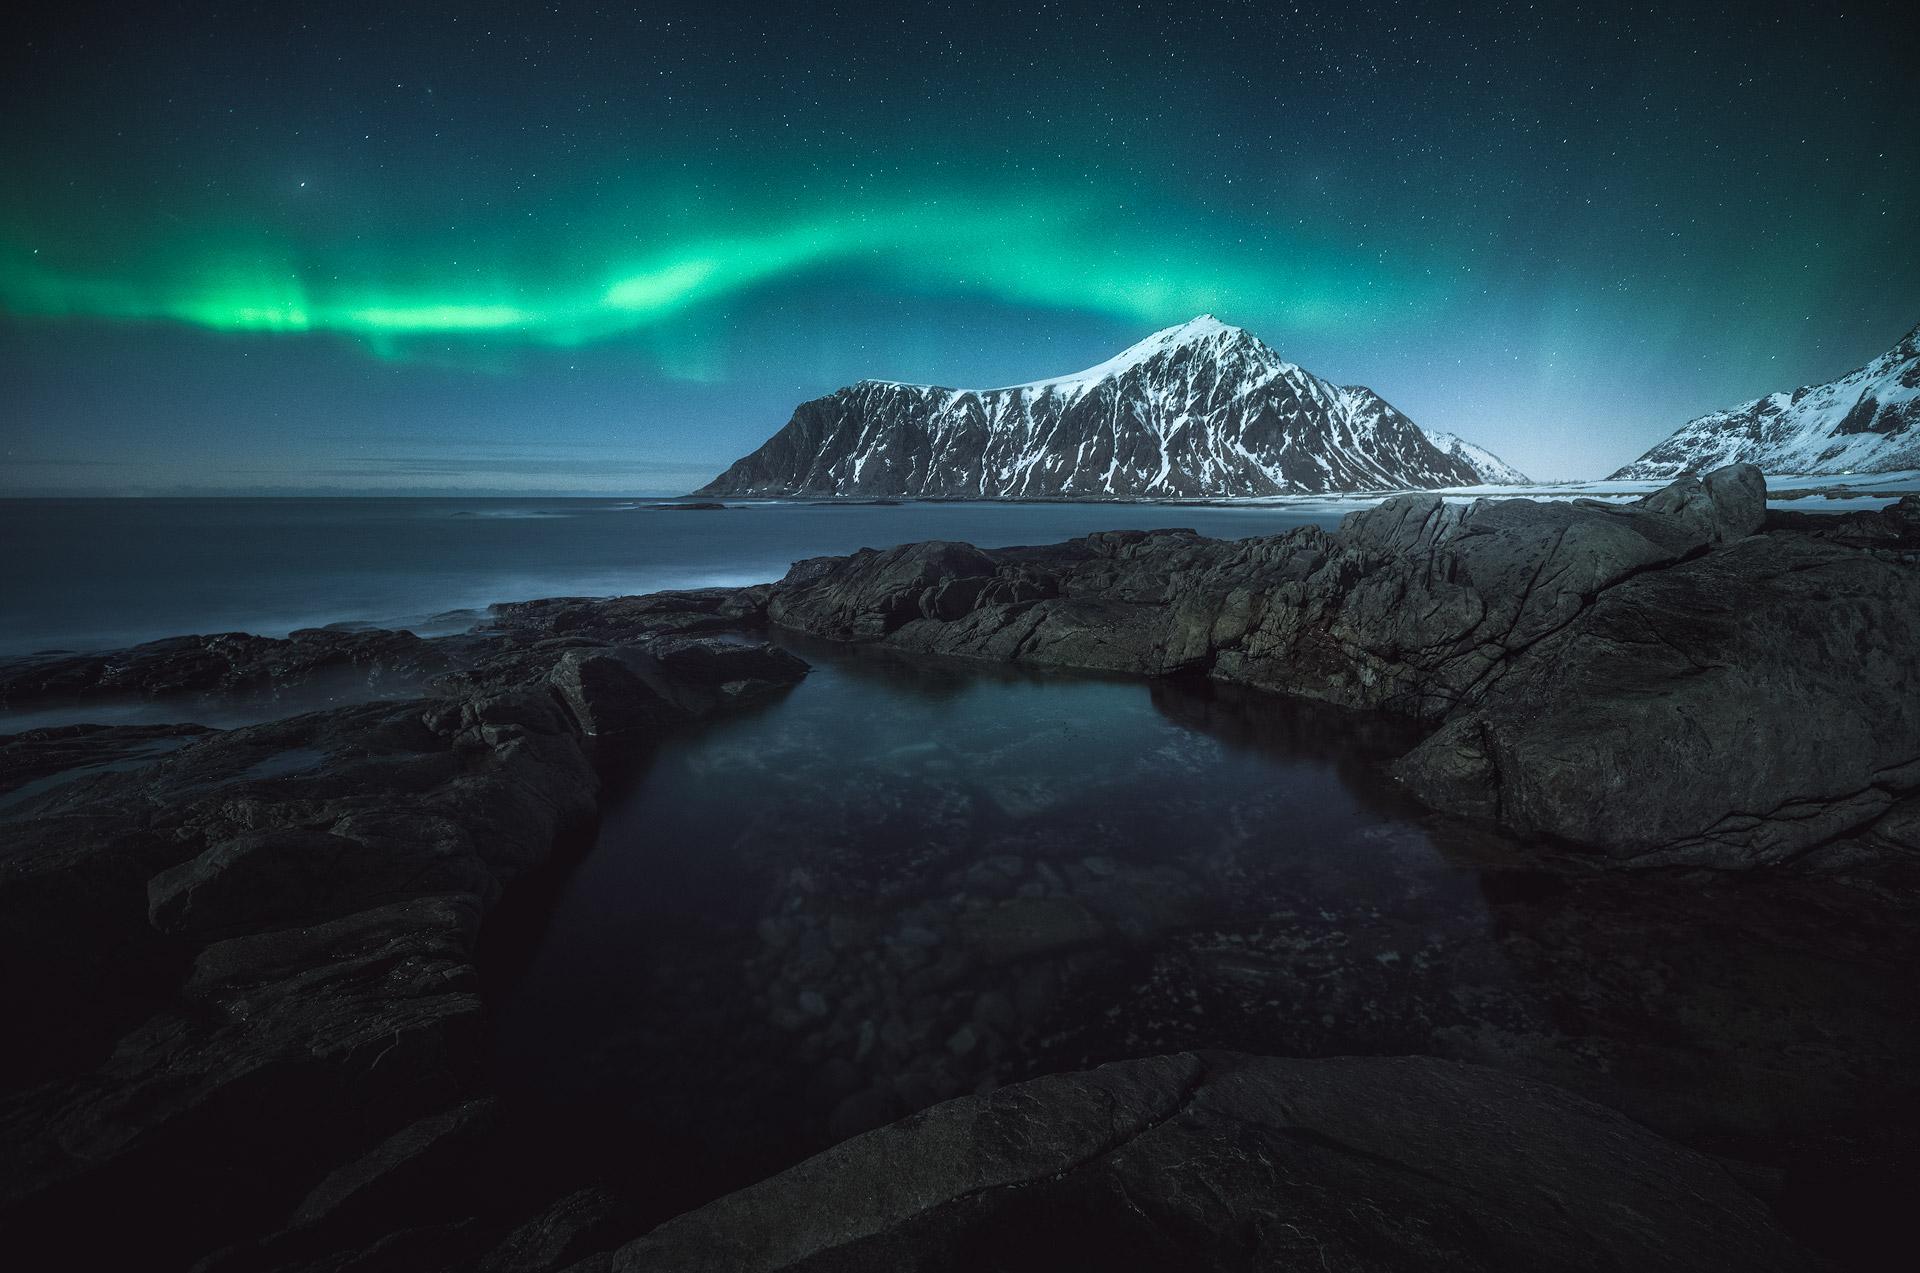 Aurora borealis over Lofoten, Norway